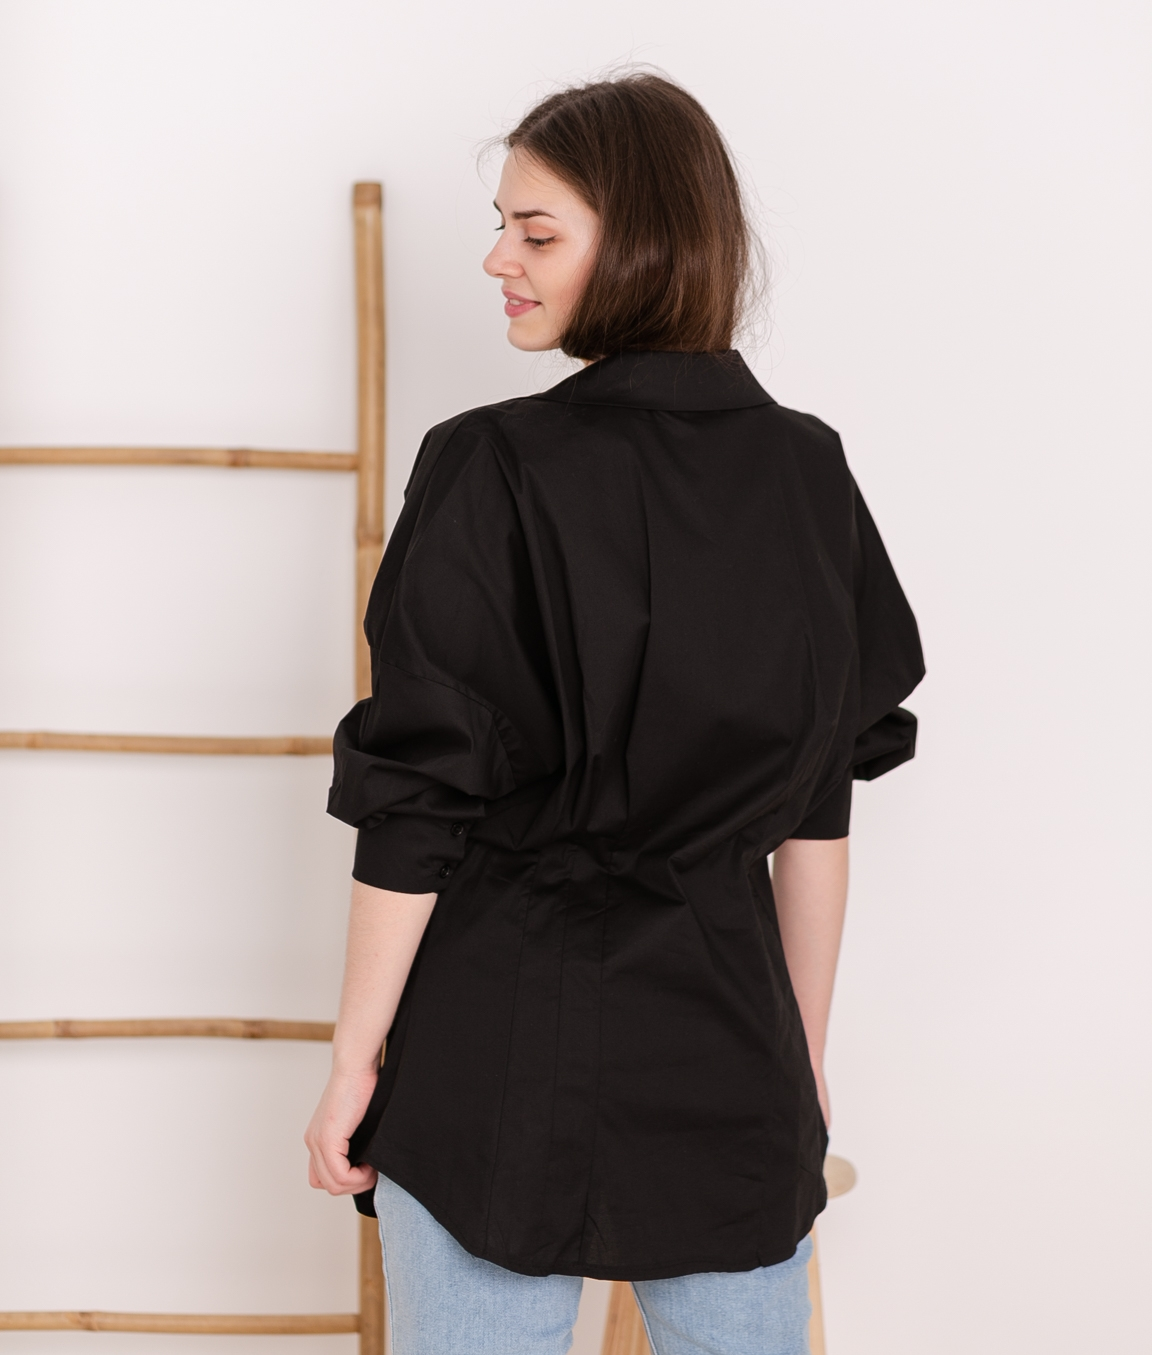 Blouse Onigumo - Black